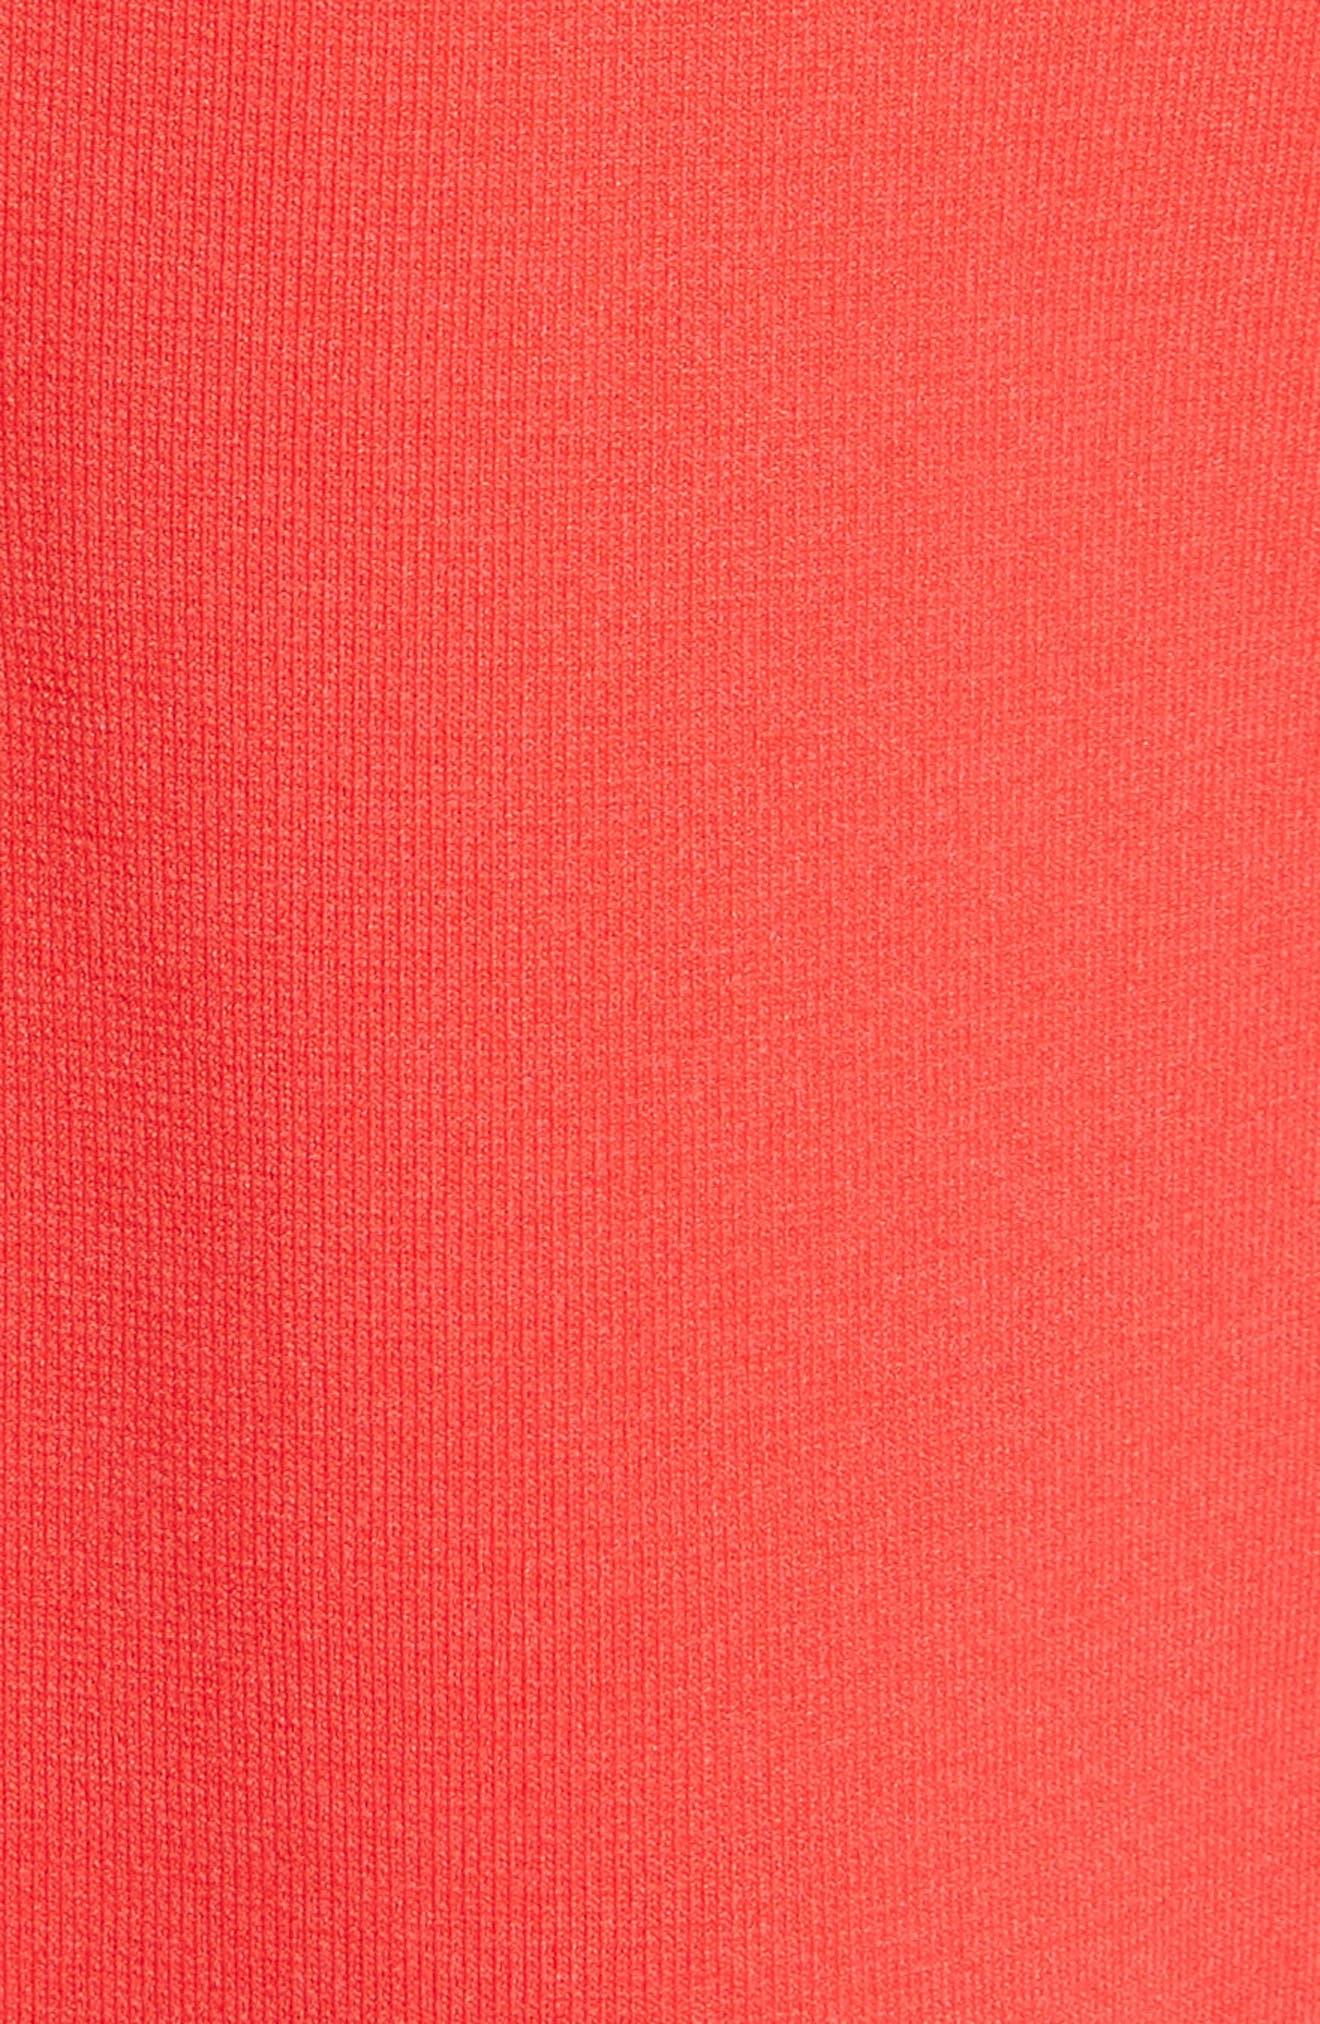 Tynia Peplum Ruffle Shift Dress,                             Alternate thumbnail 5, color,                             604